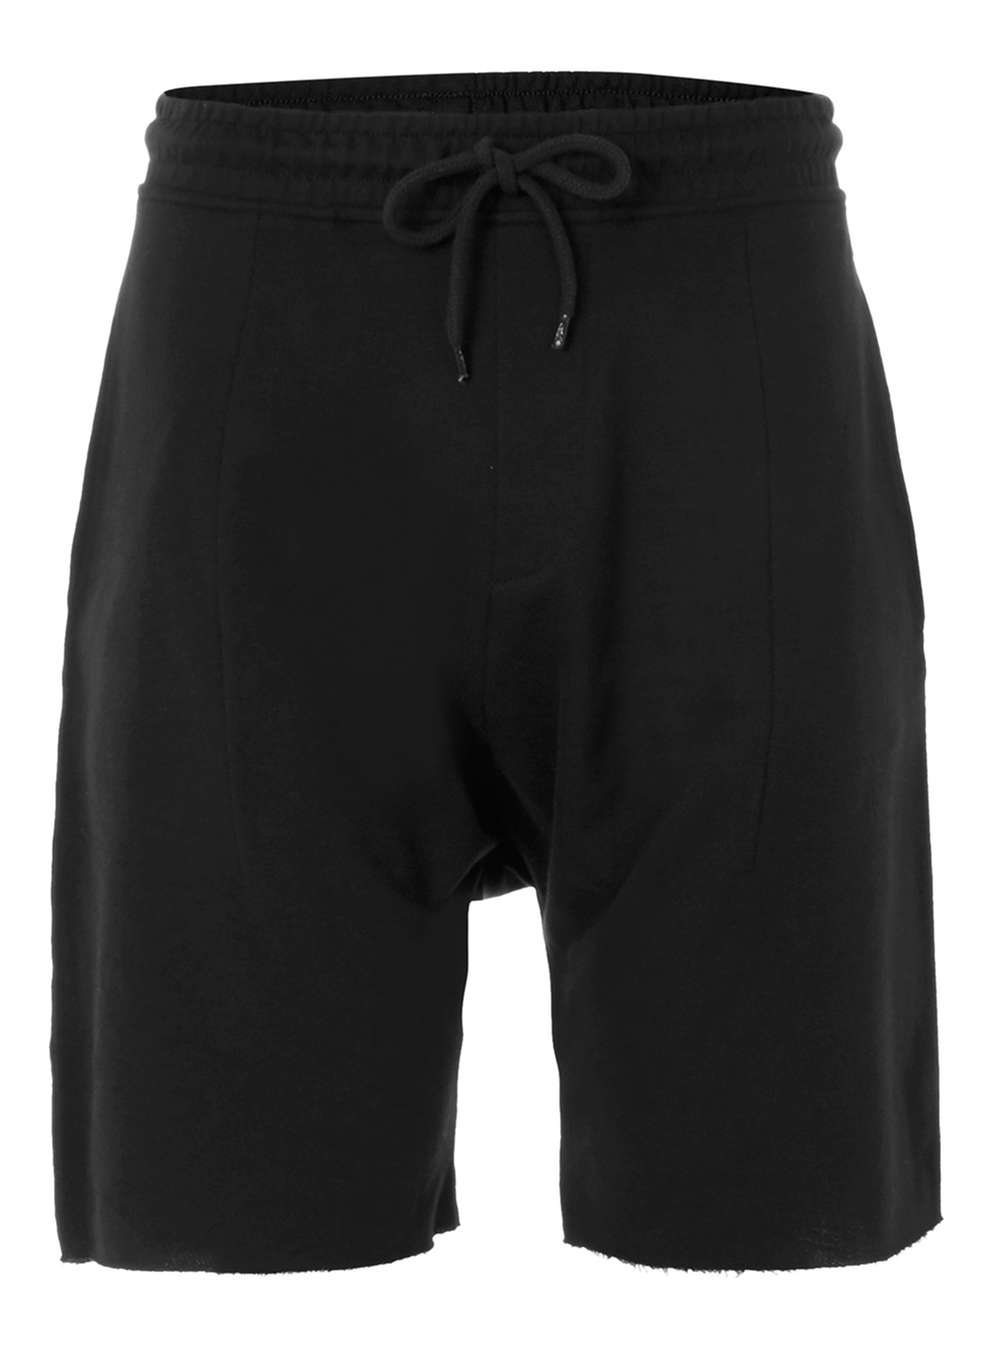 Black Drop Crotch Jersey Shorts